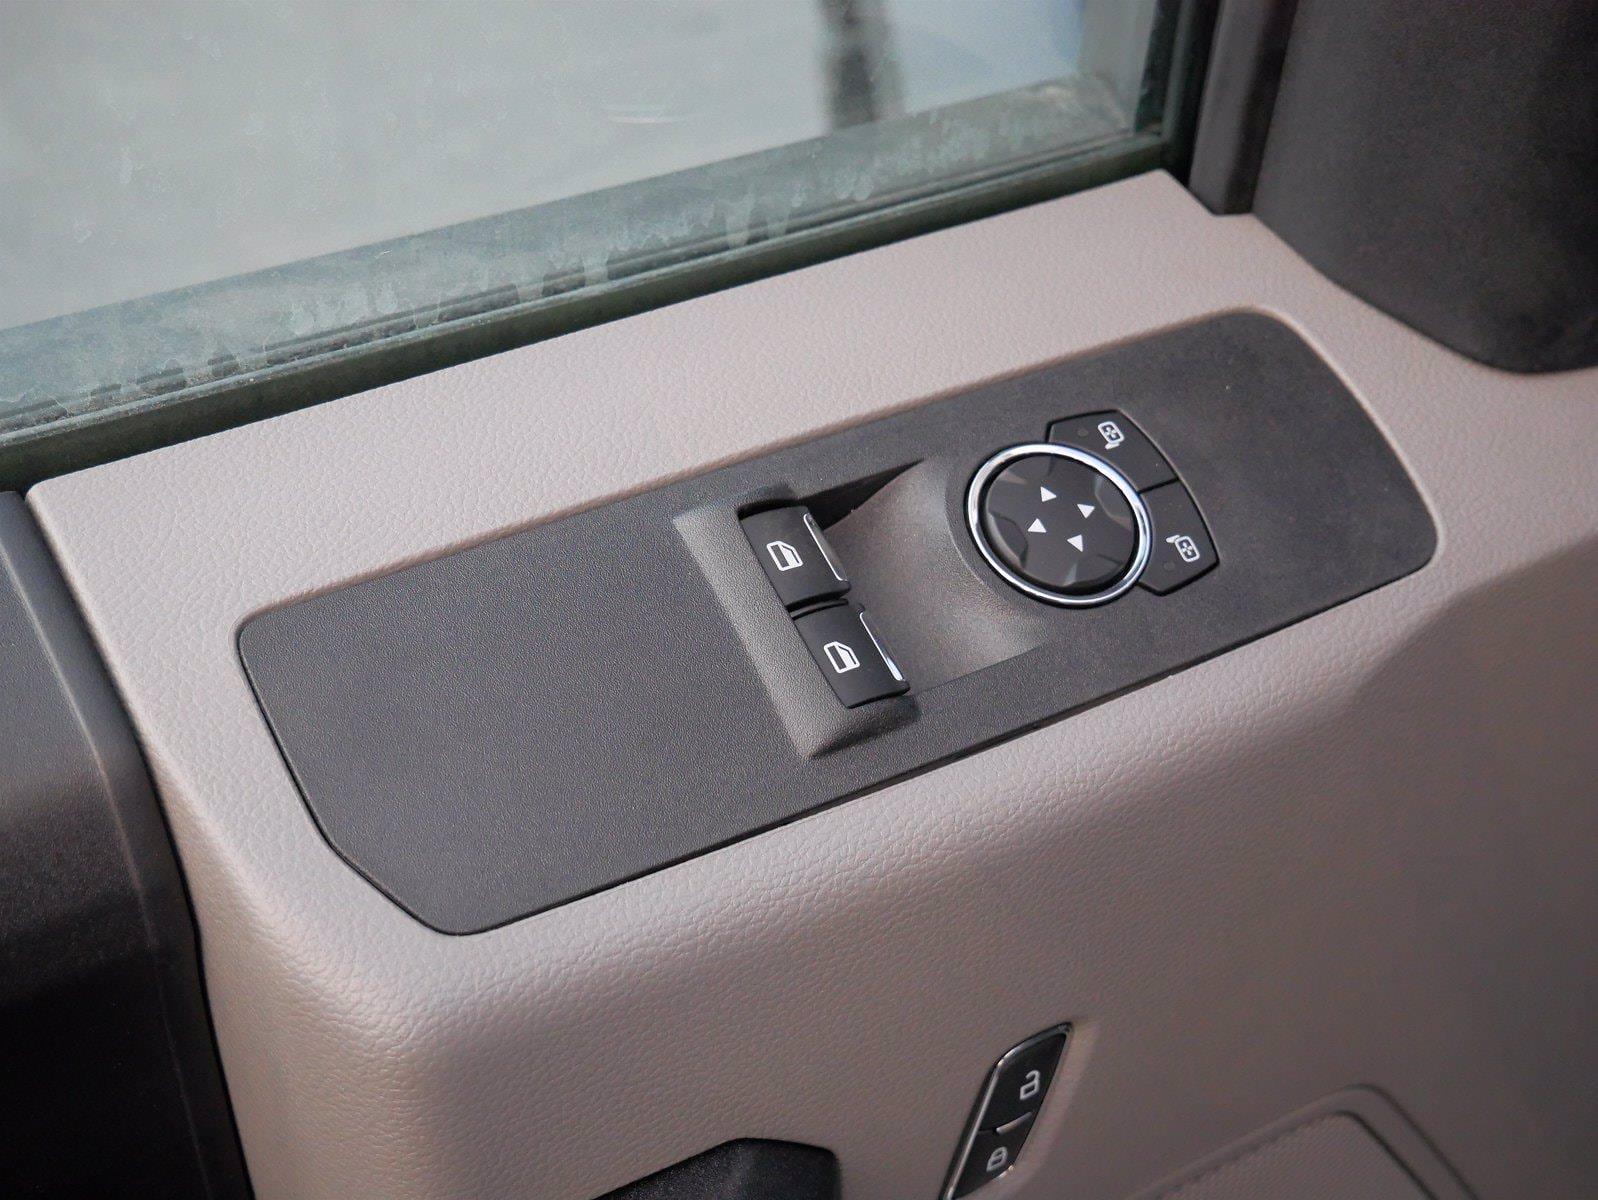 2020 Ford F-550 Regular Cab DRW 4x4, Scelzi Dump Body #63233 - photo 12